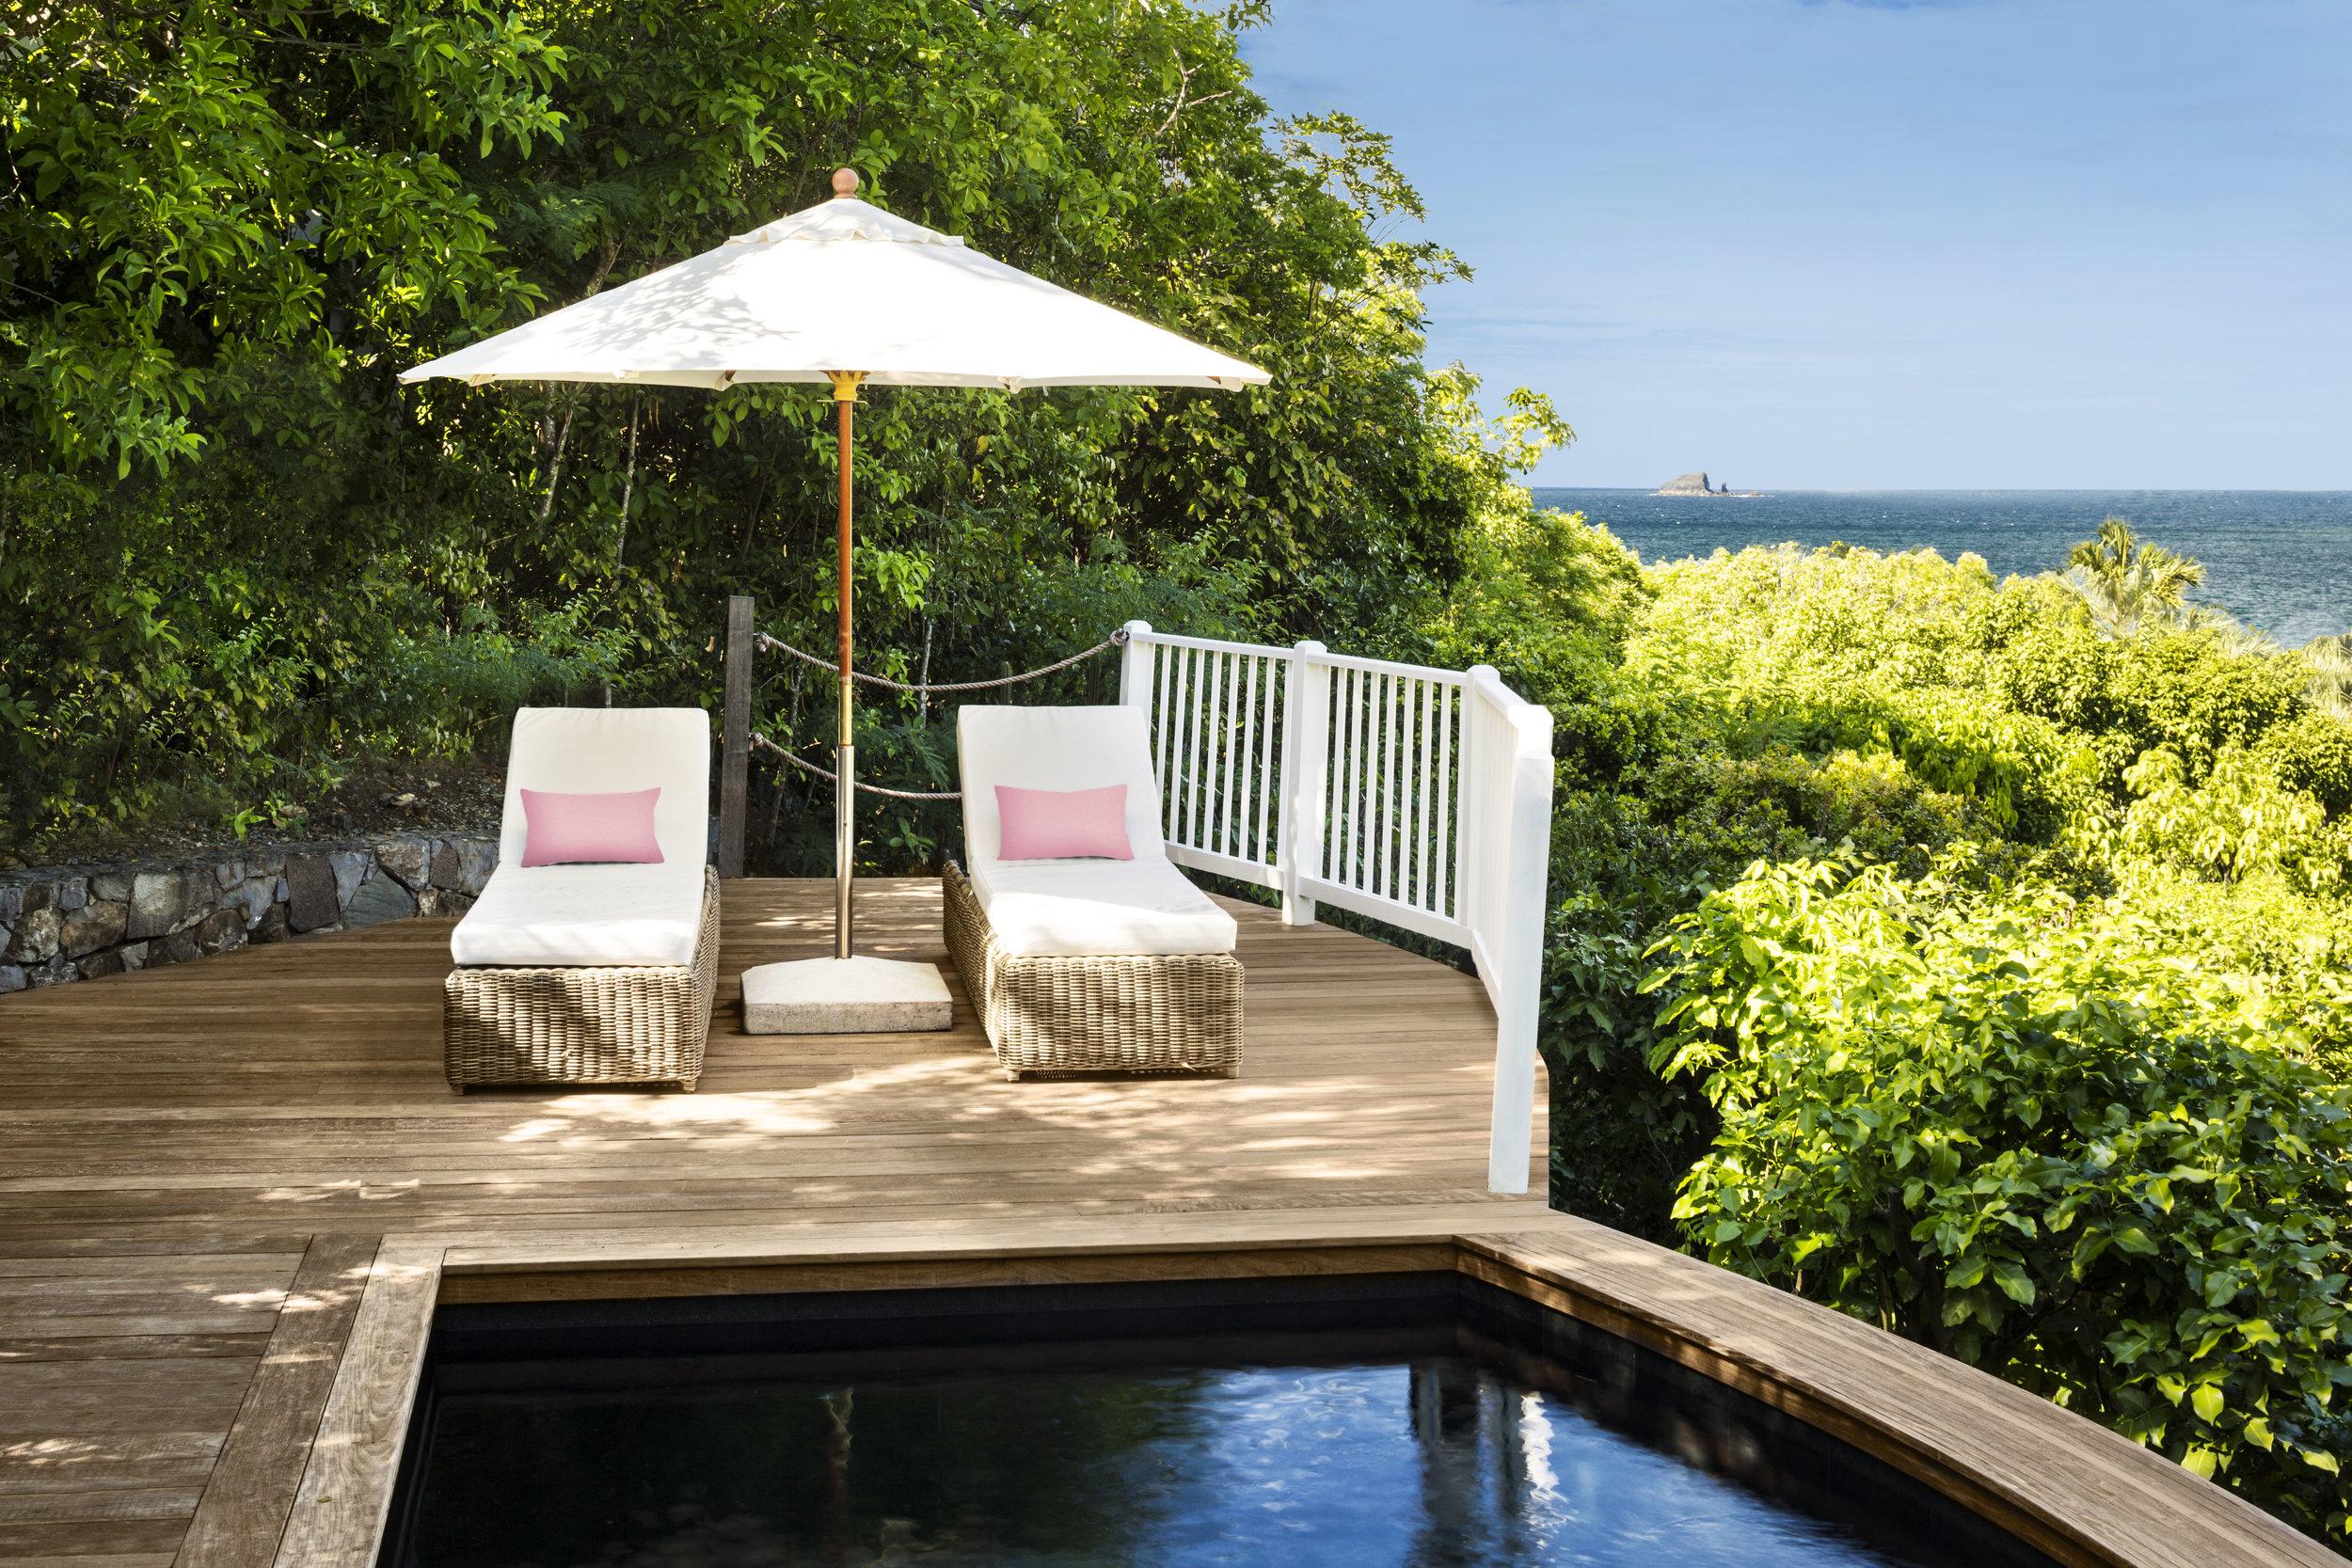 2-2-2-hillside-bungalow-pool-s-candito.jpg